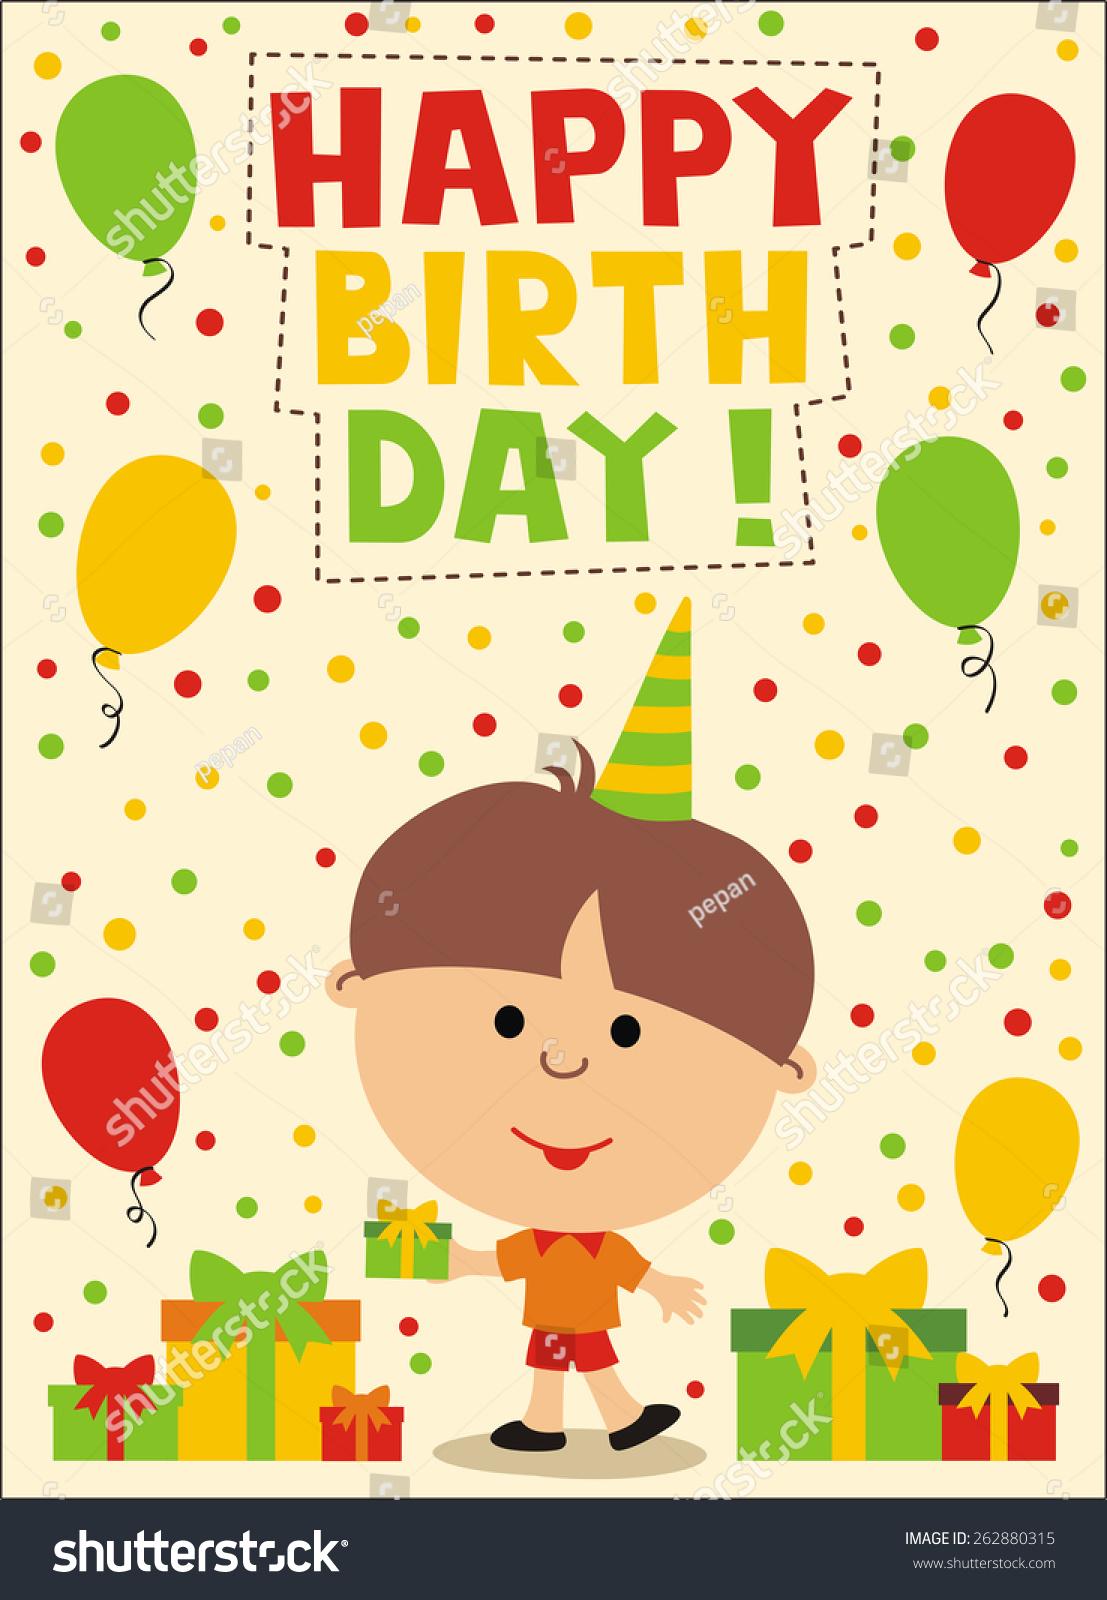 Happy birthday for little boys